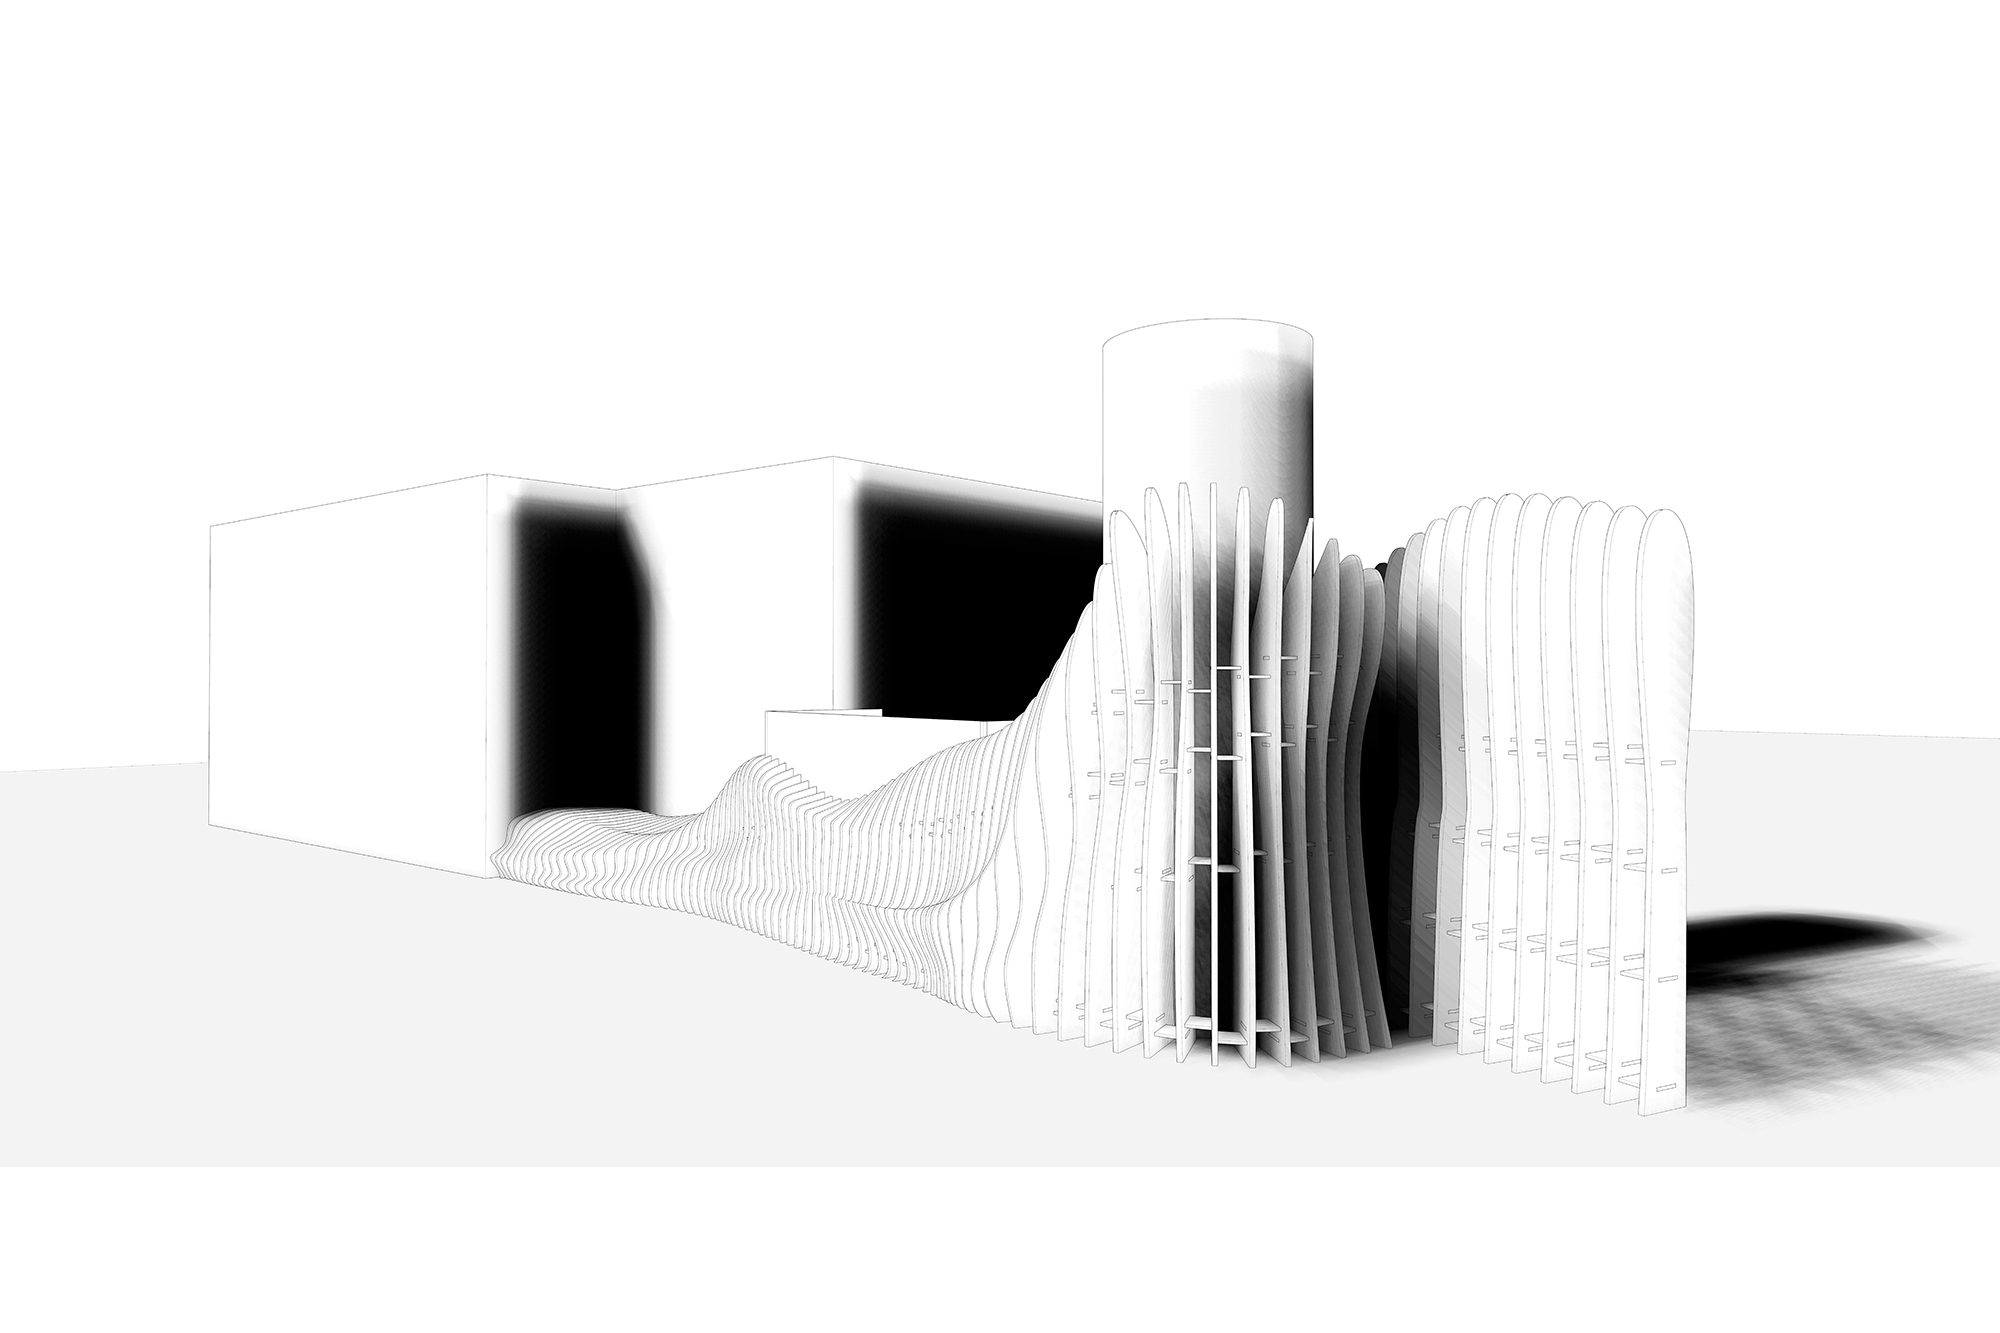 Internos-_-Diseño-_-EXarchitects_09